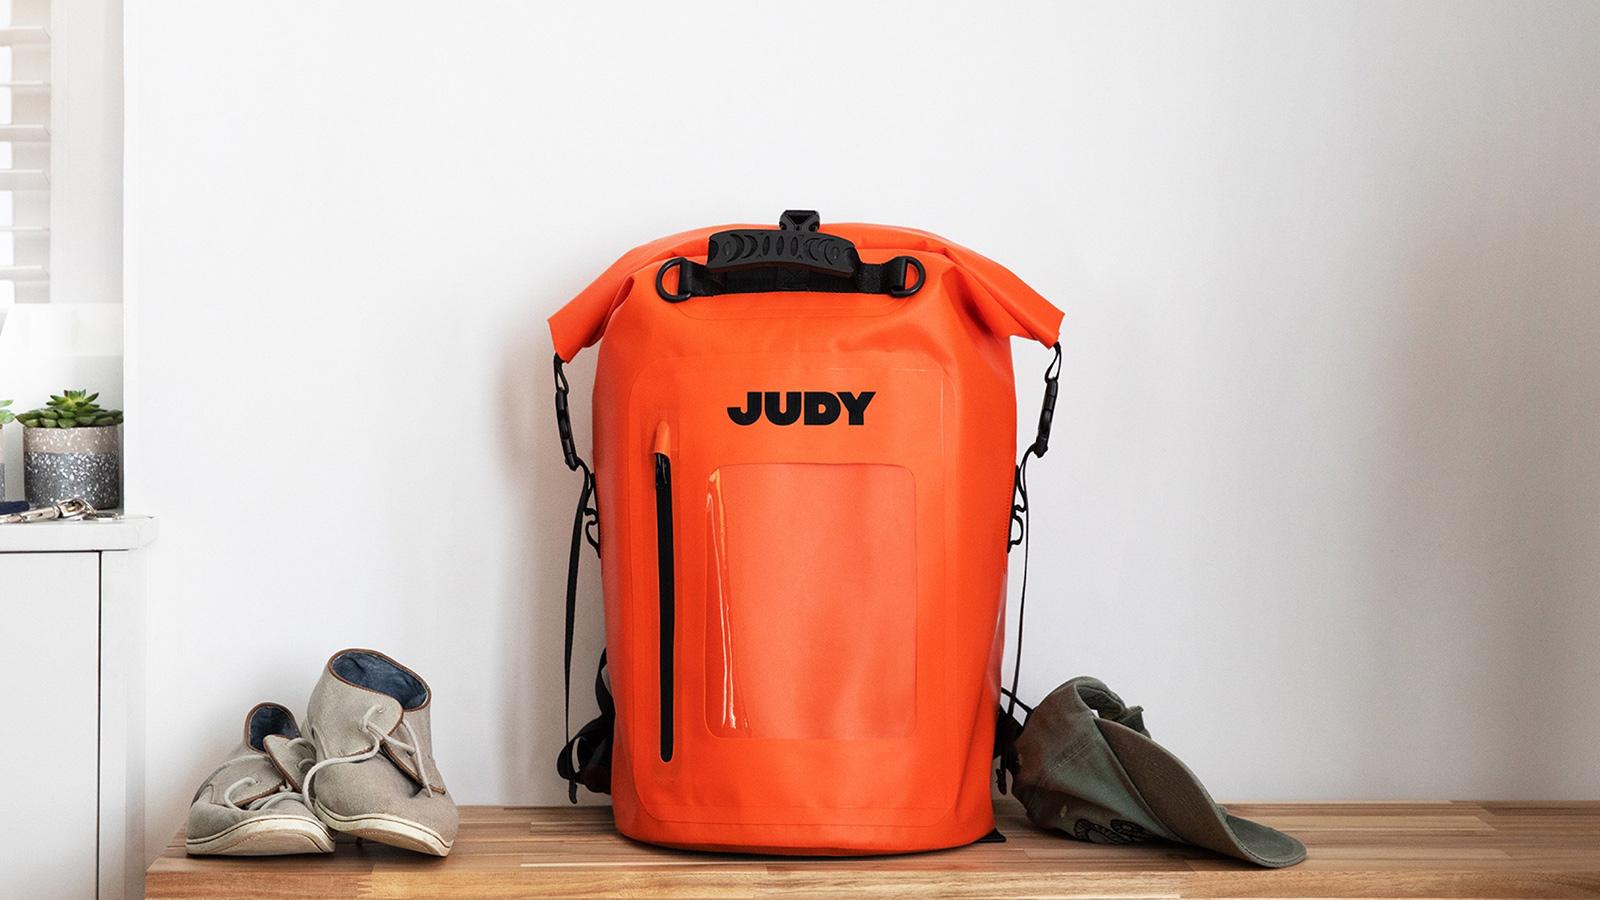 JUDY Mover Max